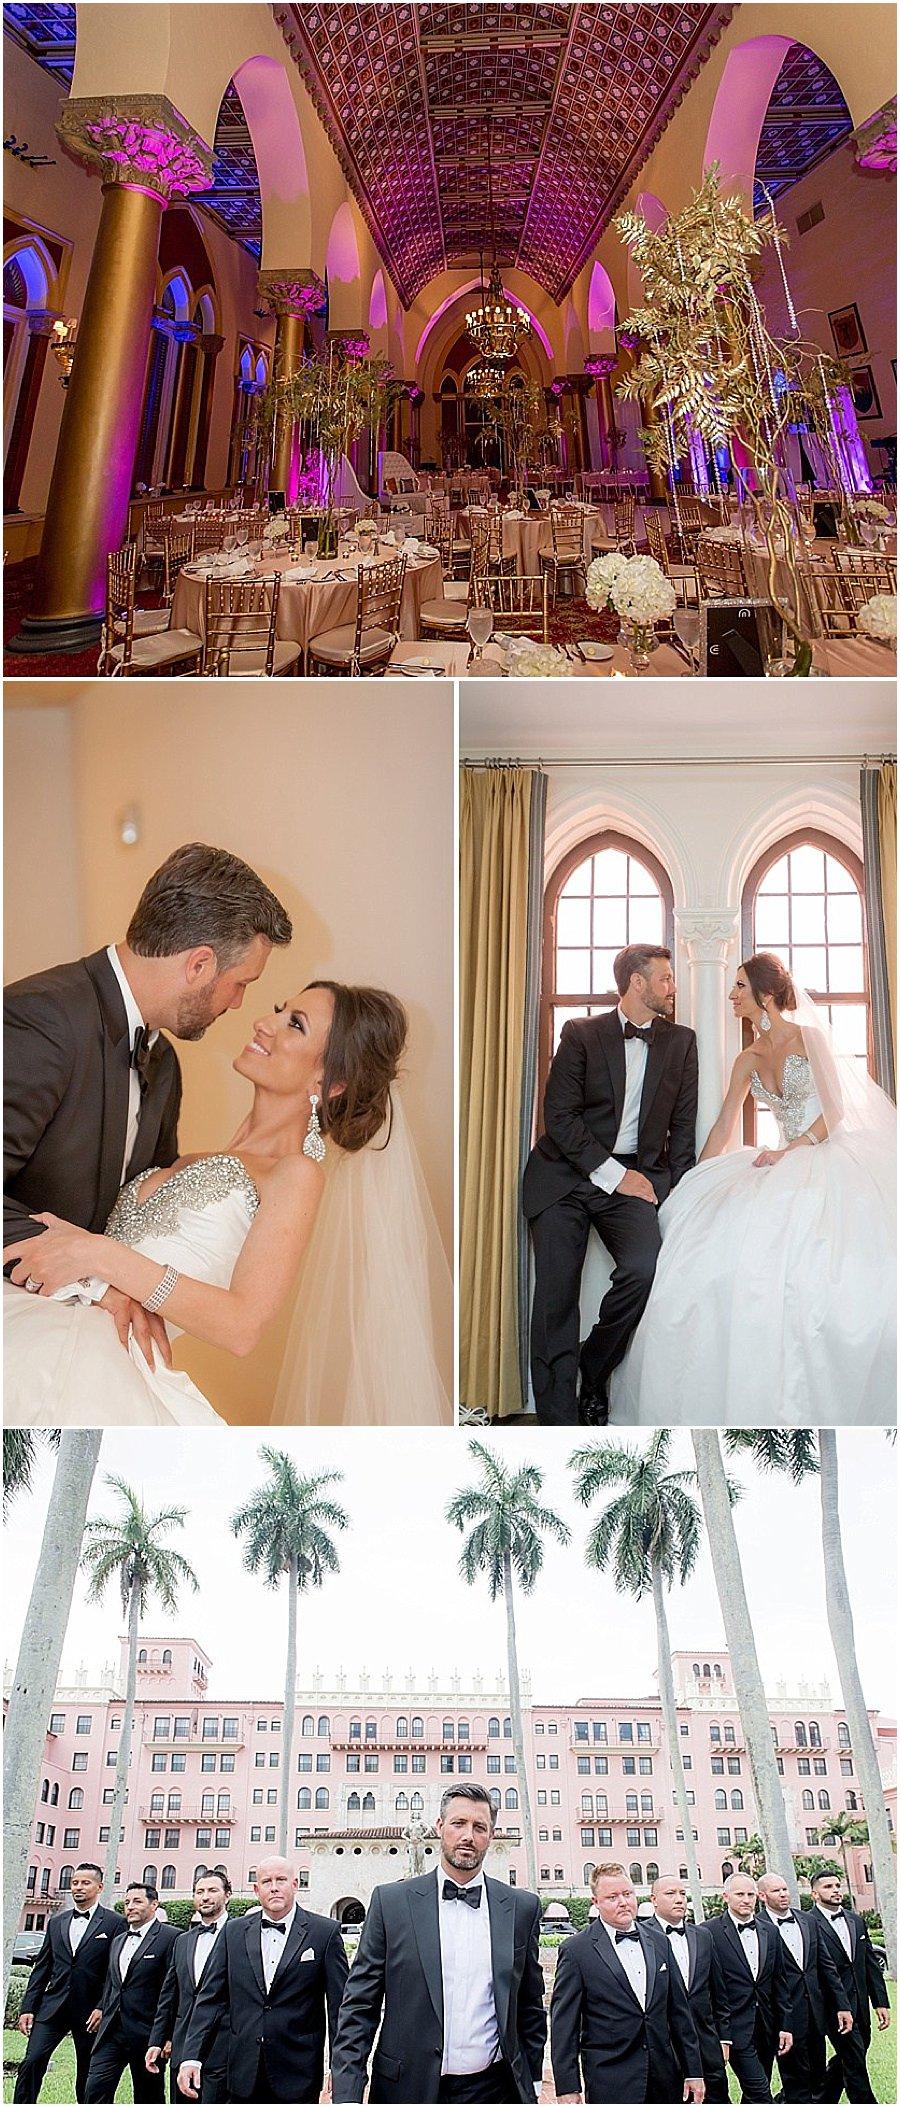 Palm Beach Wedding Venue_Boca Raton Resort_Chris Joriann Photography